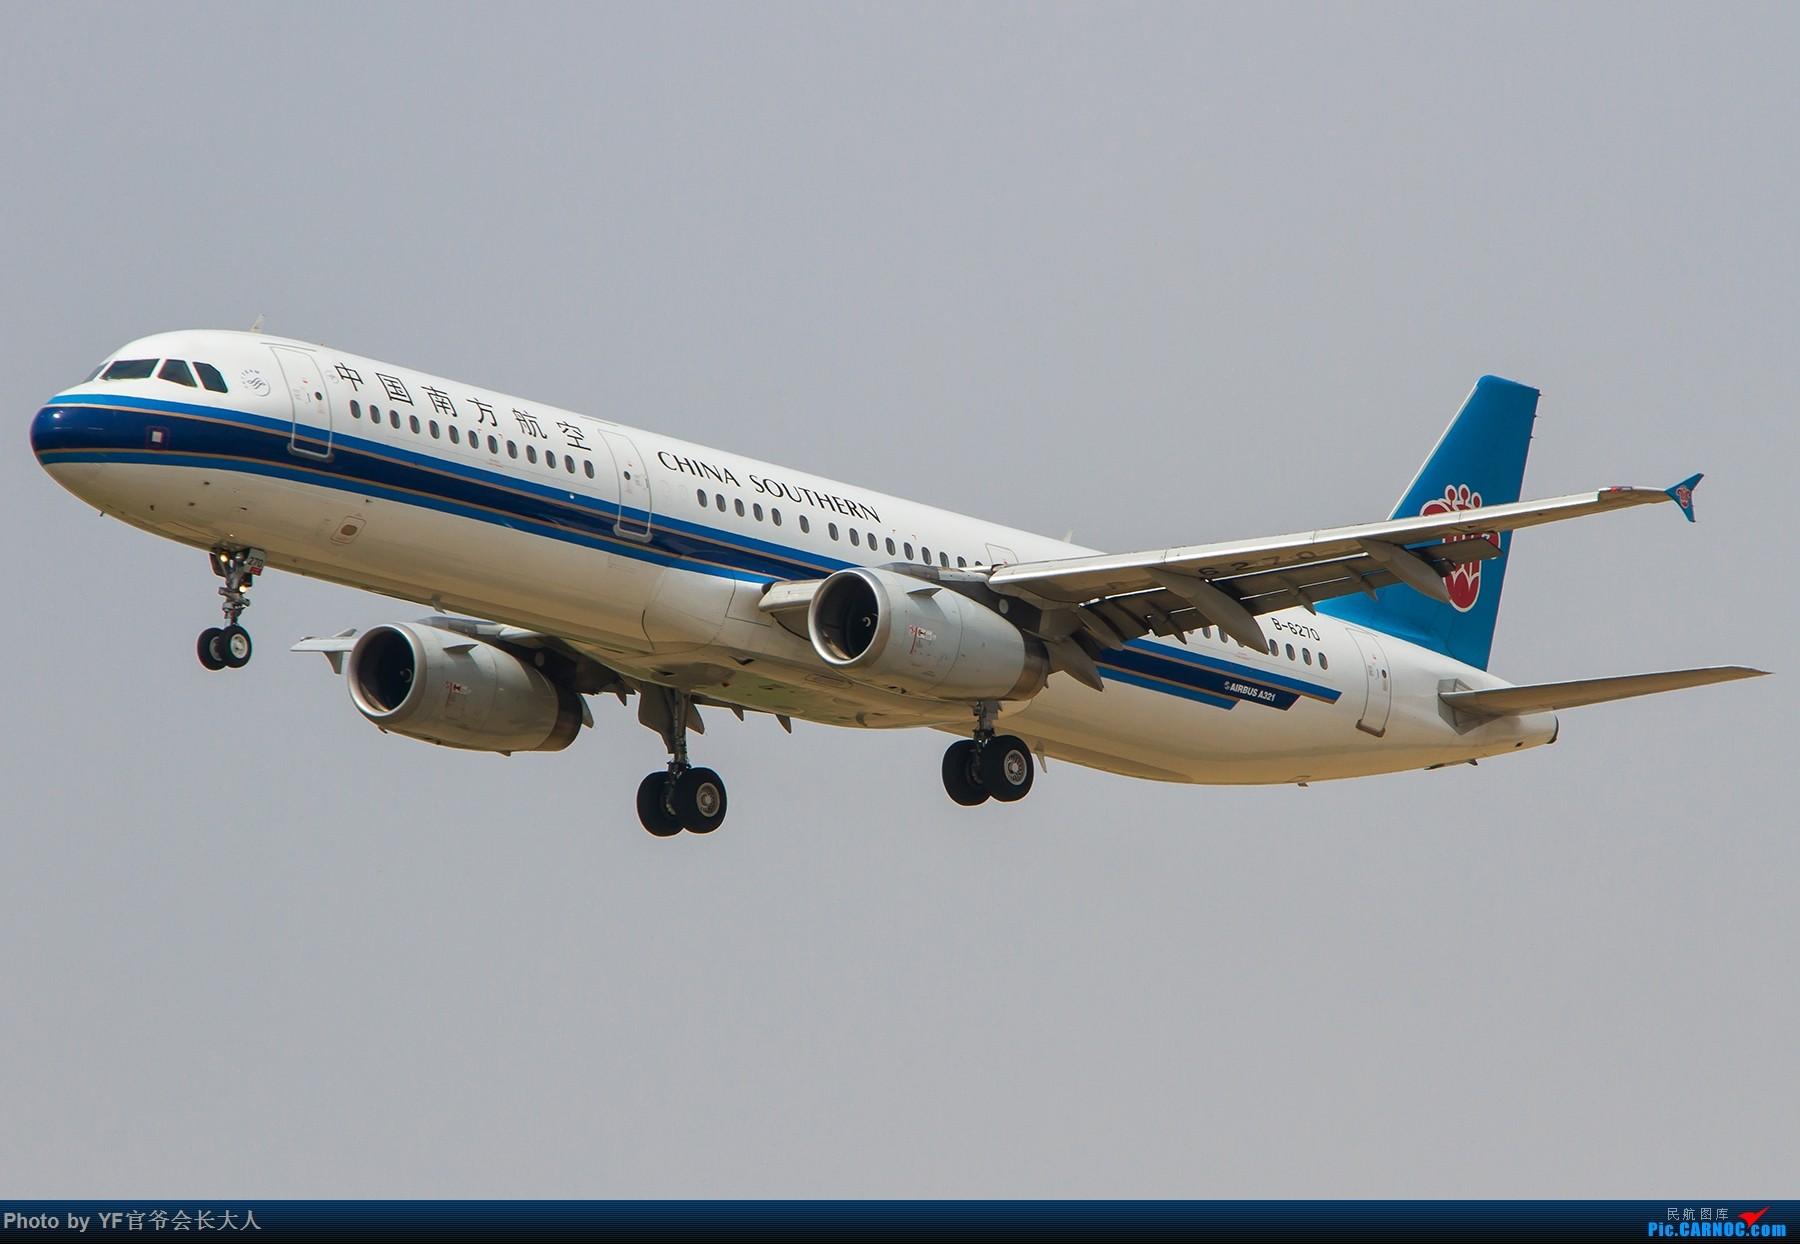 Re:[原创]【ZYTX】轻易不拍机,拍就要拍个过瘾!(新开的酷鸟,亚洲大西洋,顺带碰上朝韩两国的好货) AIRBUS A321-200 B-6270 中国沈阳桃仙国际机场